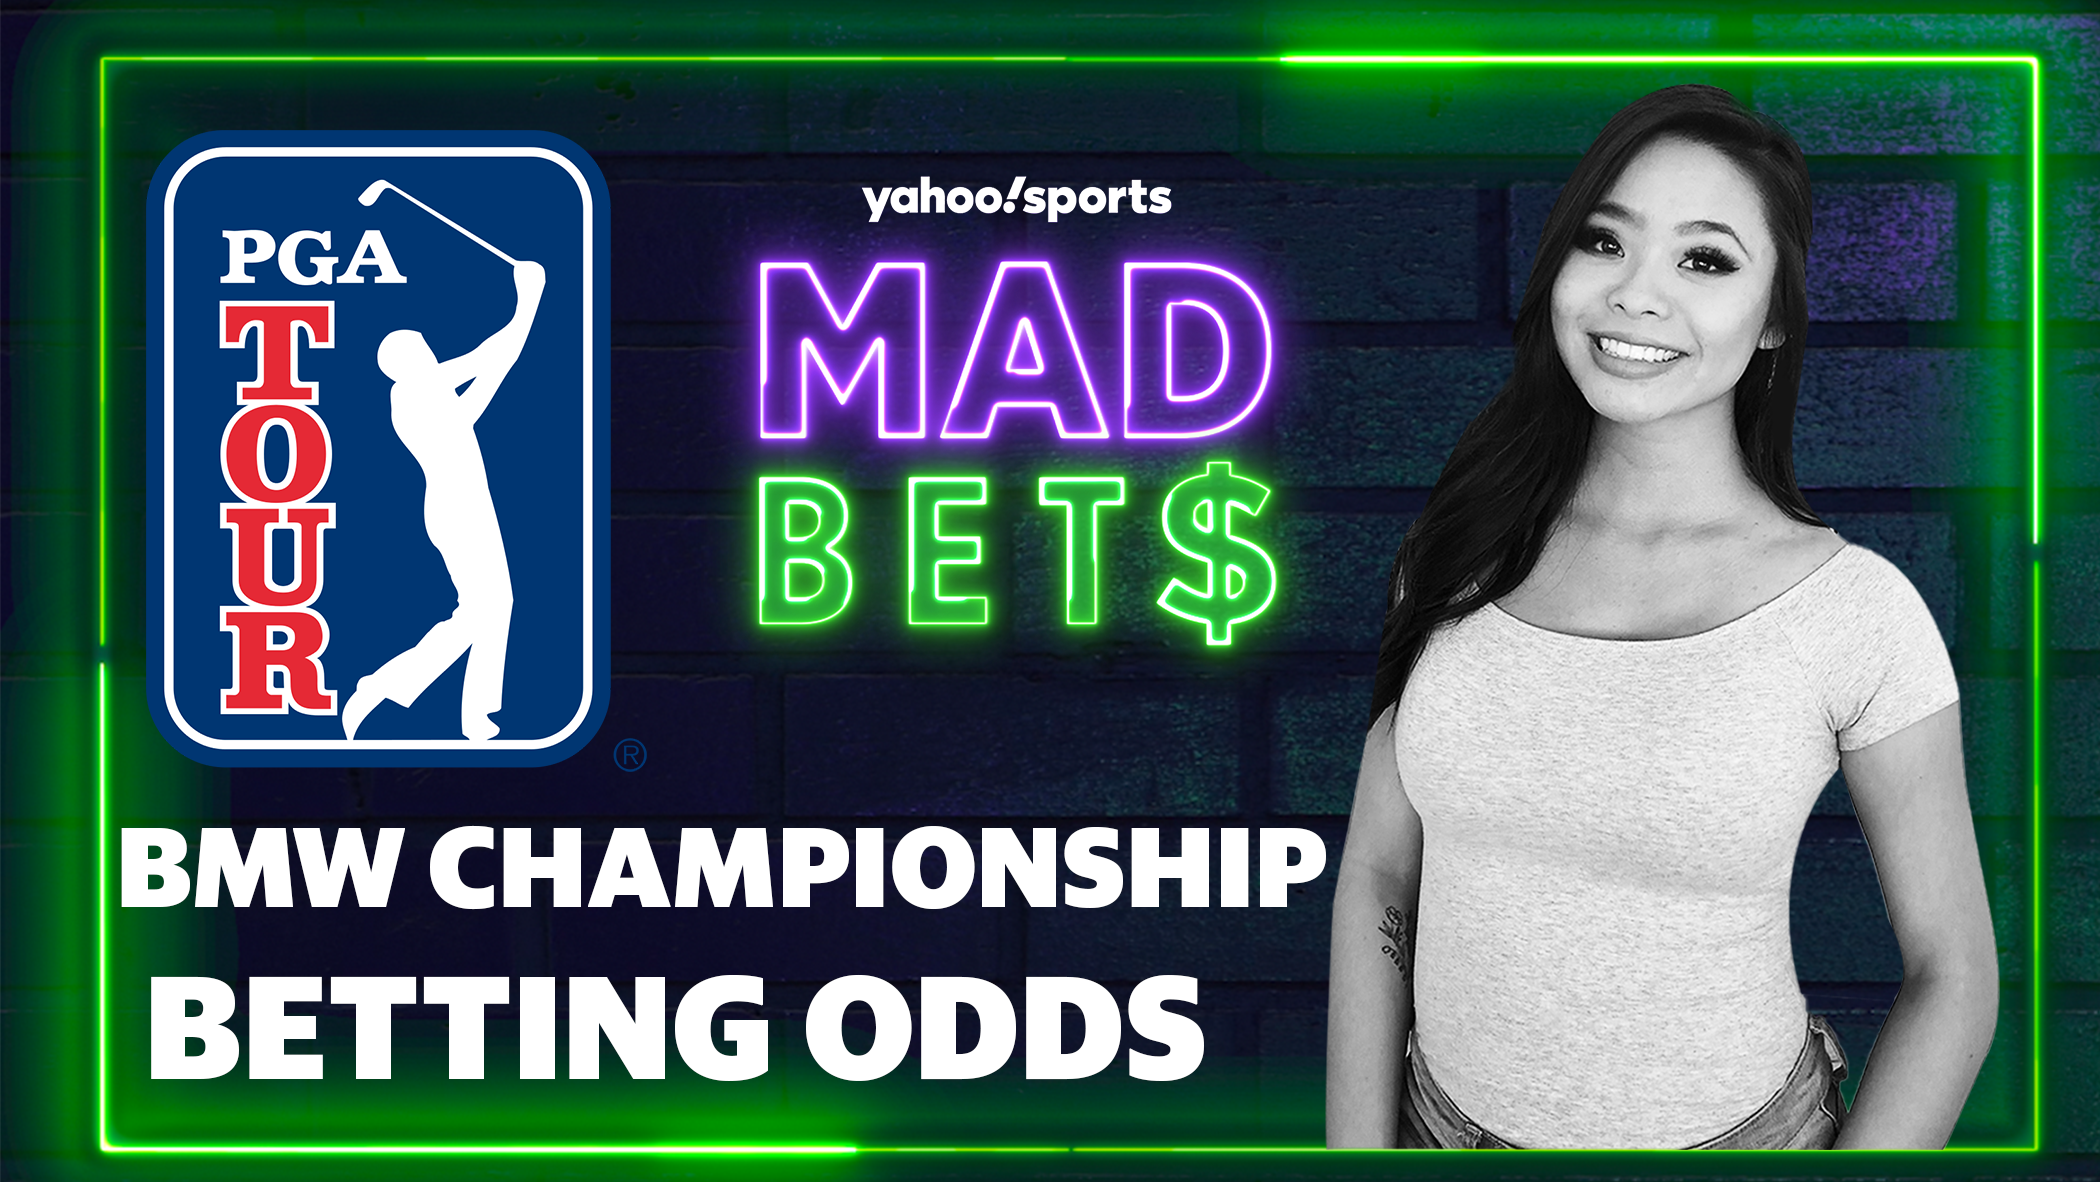 Simone betting odds ta18 bitcoins